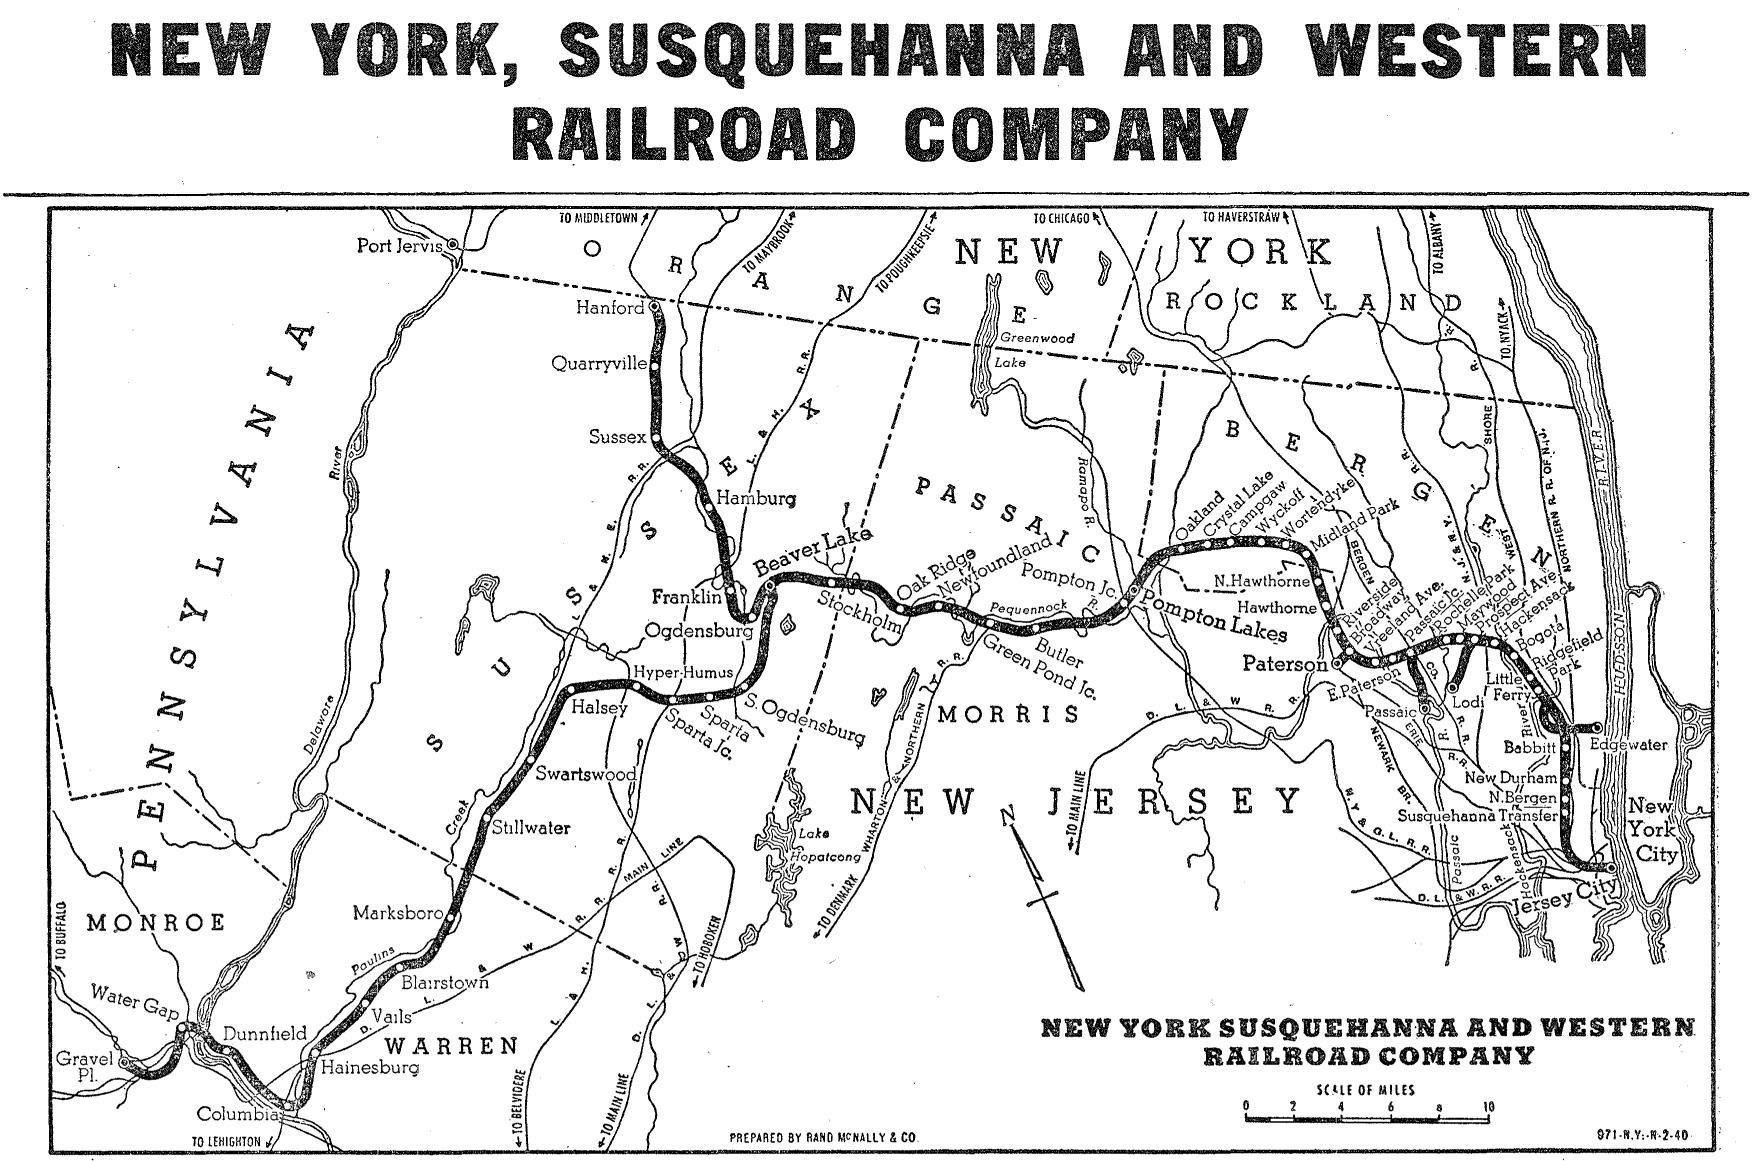 New York Susquehanna And Western Railway